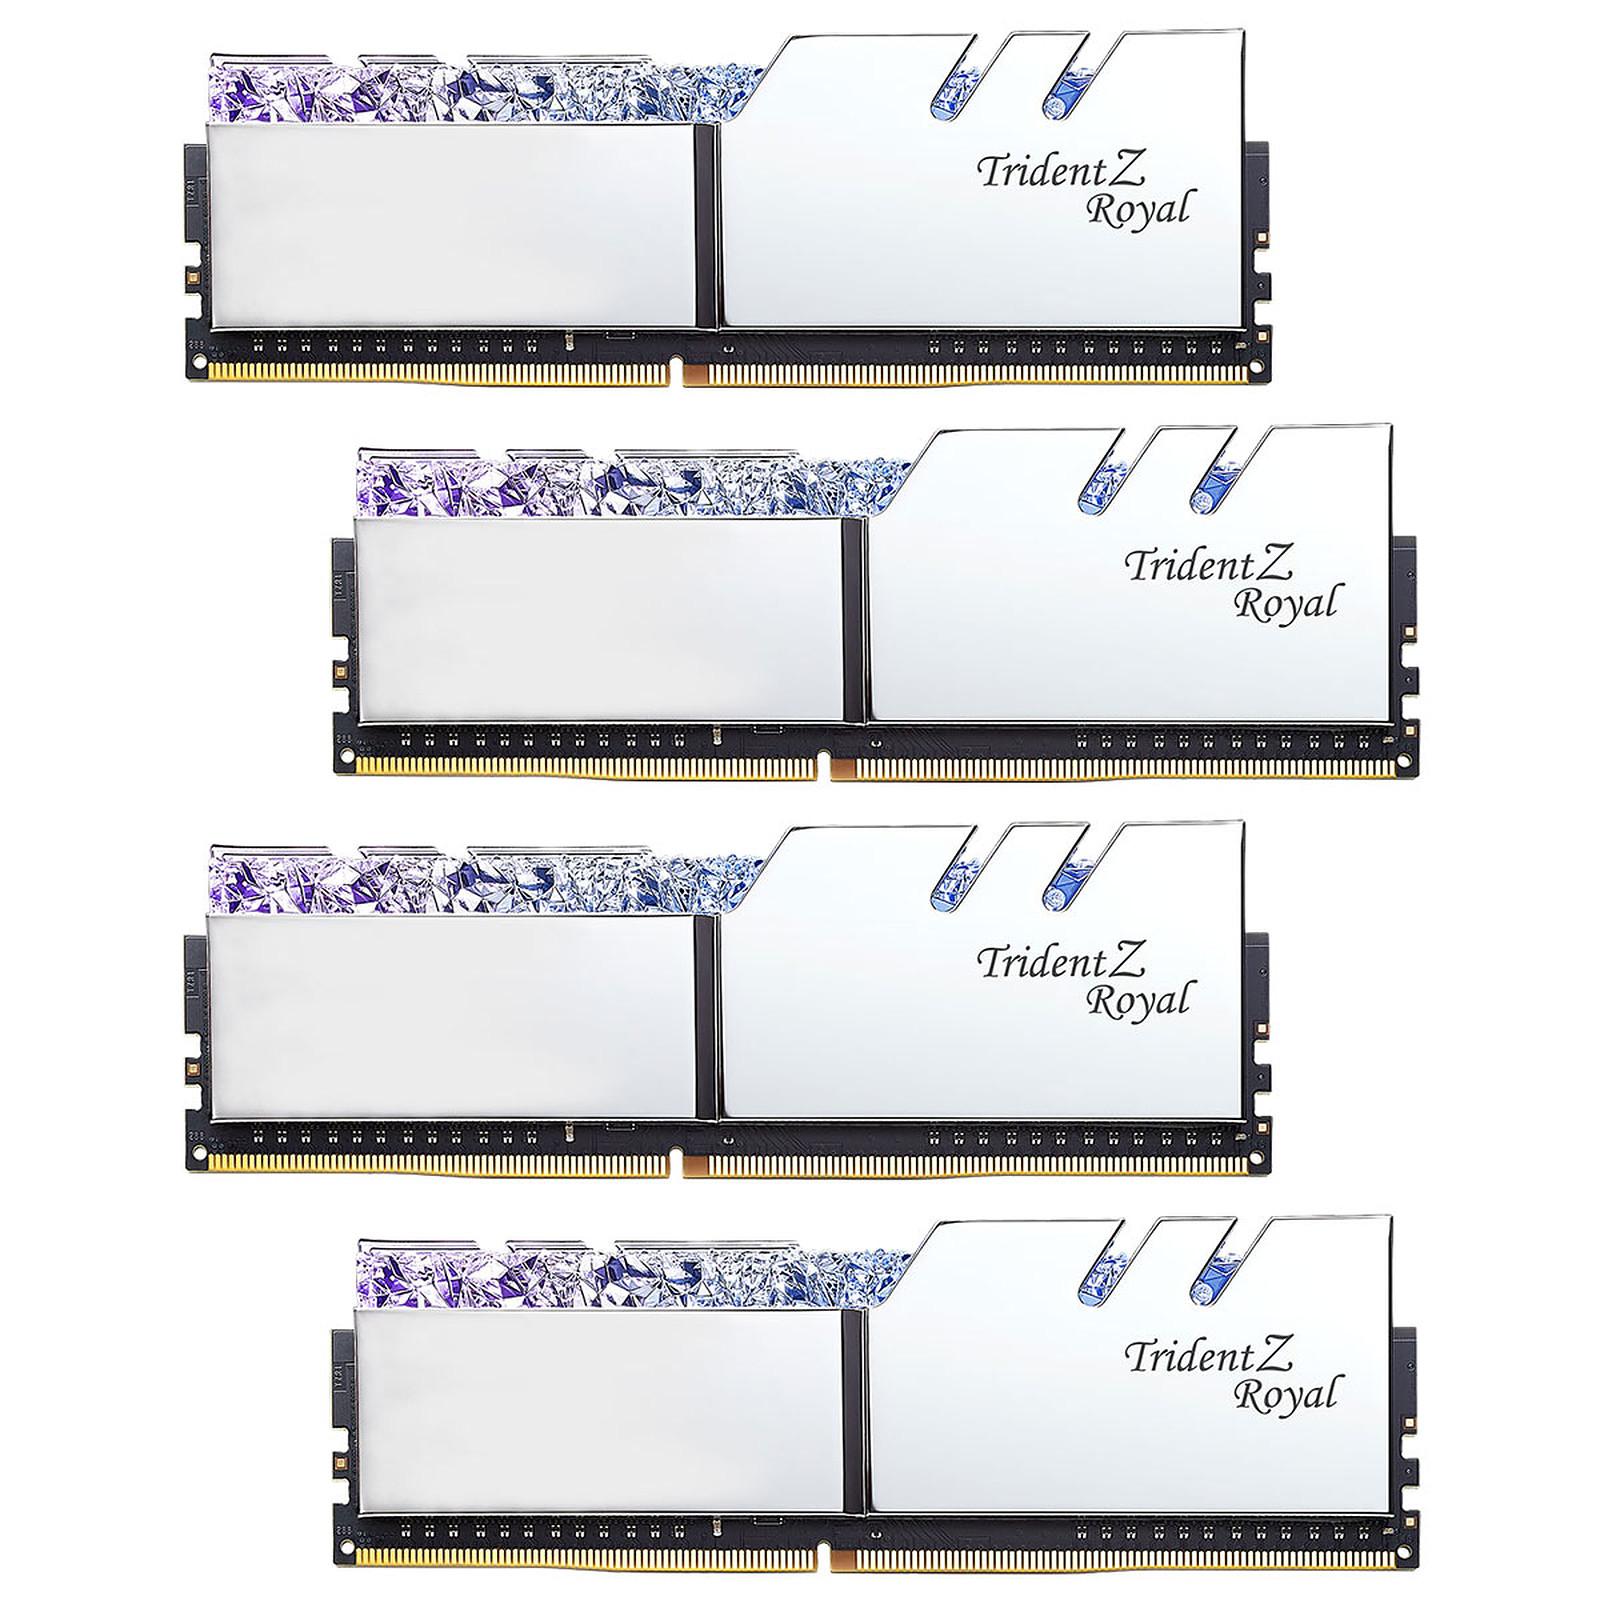 G.Skill Trident Z Royal 32GB (4 x 8GB) DDR4 4000 MHz CL17 - Plata